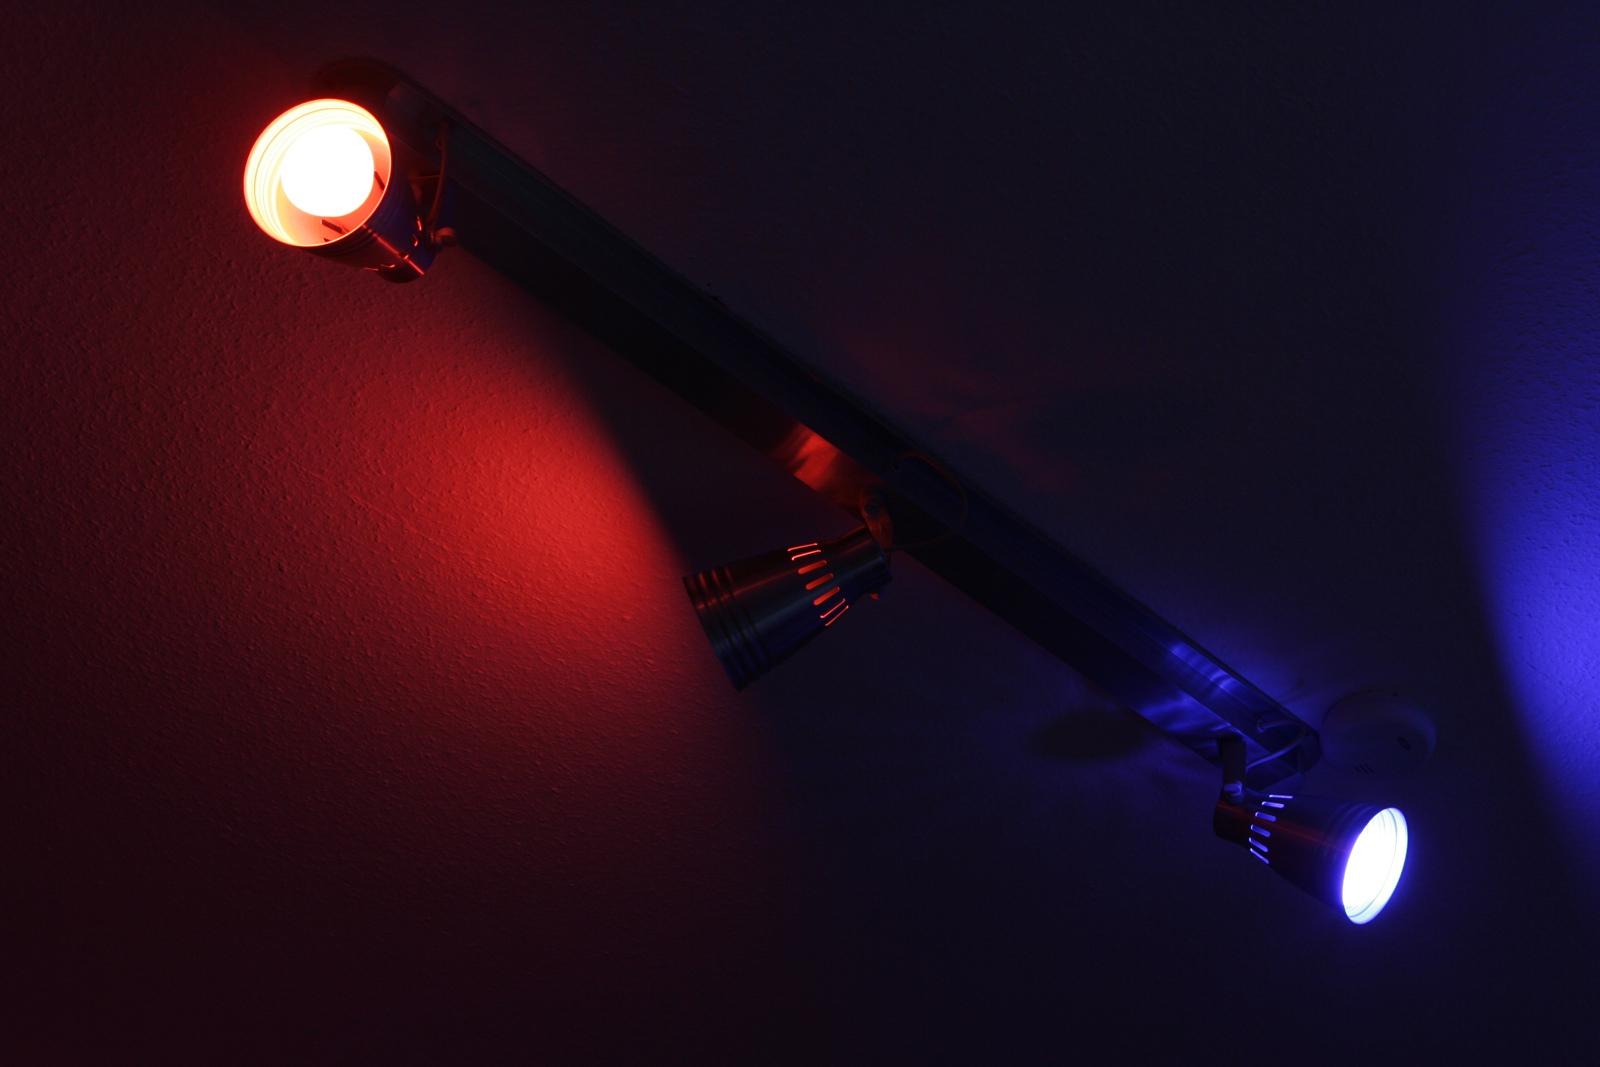 Philips Hue Lampen : Kurz angeschaut philips hue hardwareluxx